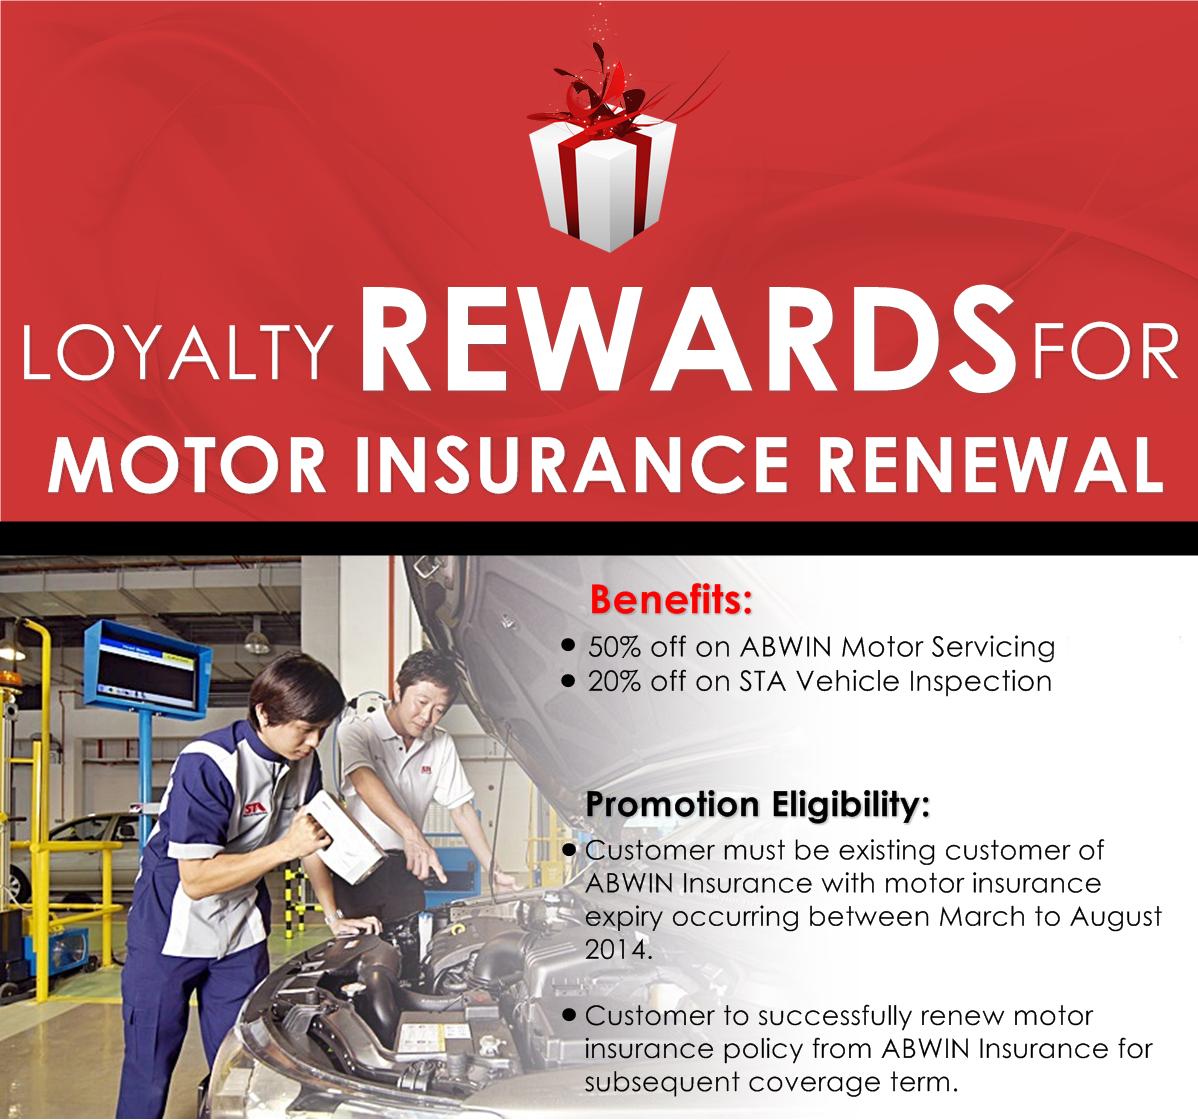 Loyalty Rewards For Motor Insurance Renewal